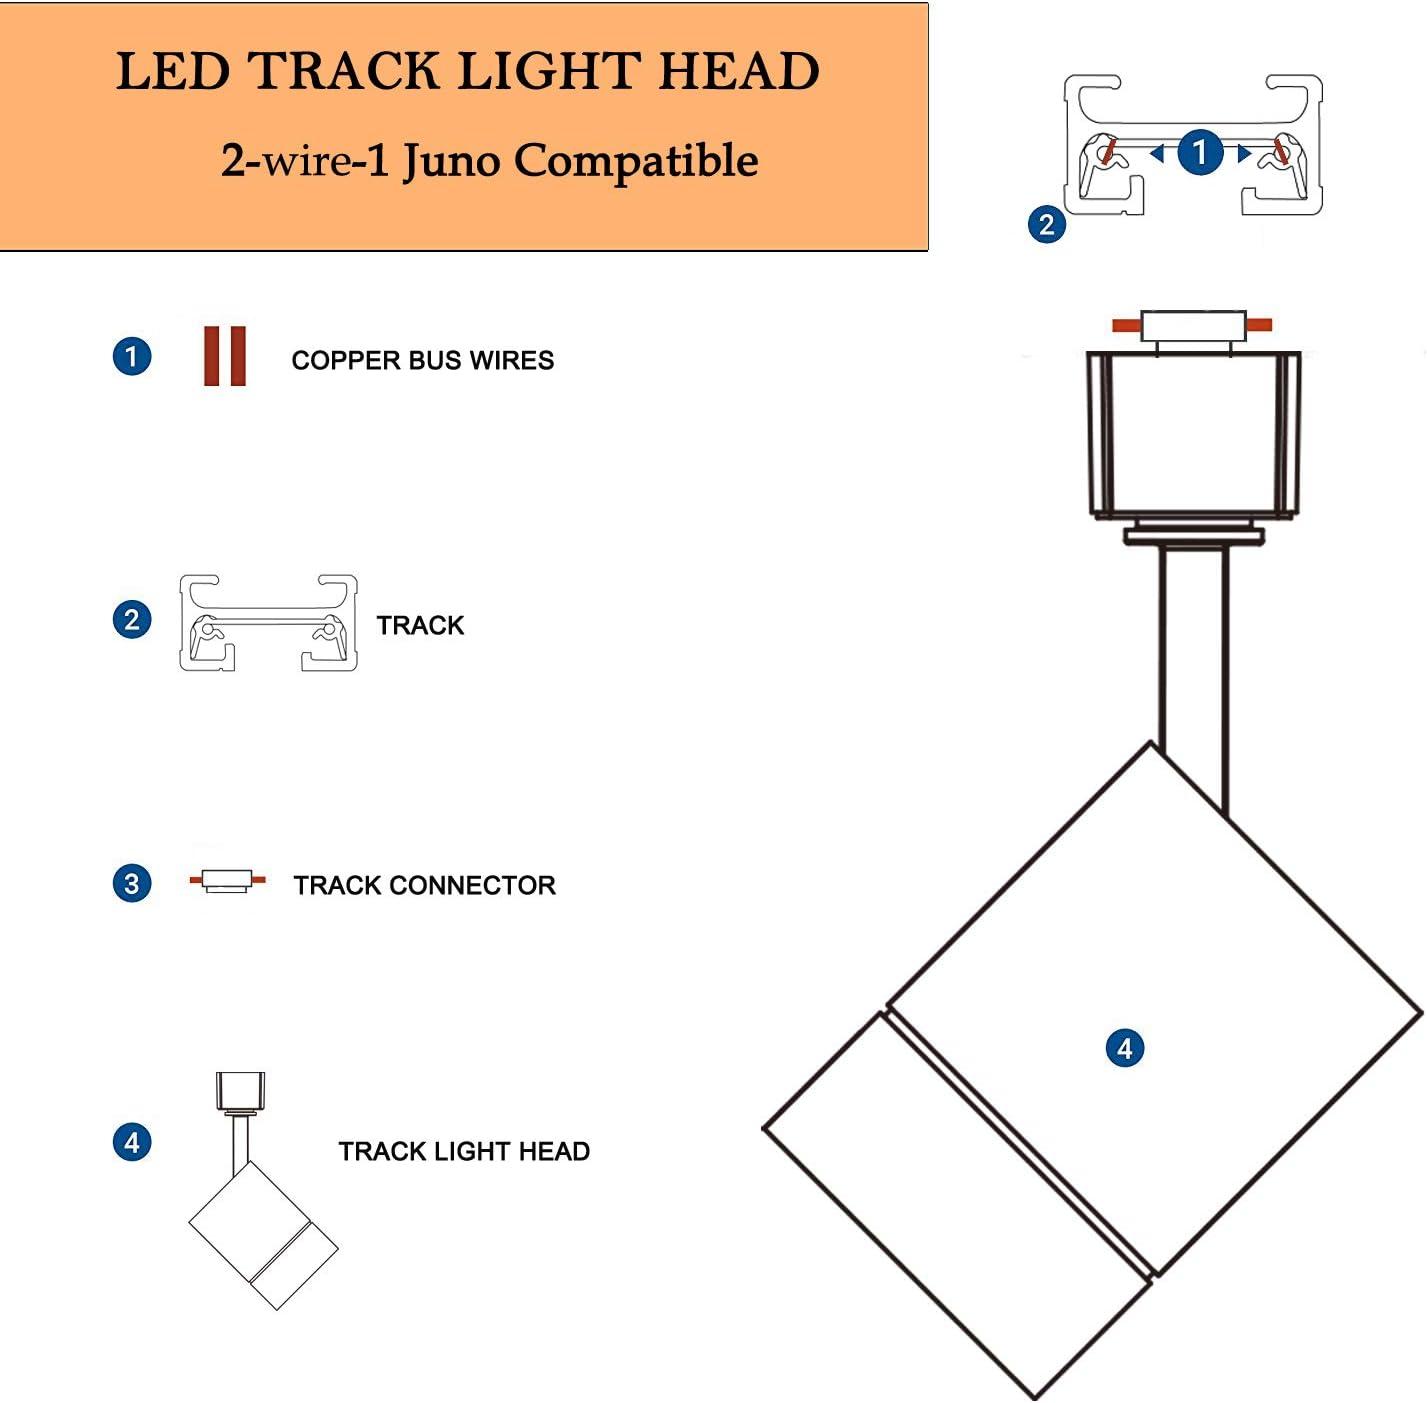 [SCHEMATICS_4JK]  4-Pack LED Cylinder Track Lighting Heads for 2-Wire-1 Compatible Juno Track  - FLSNT 12W (75W Equiv.) Dimmable 24° LED Spotlight Track Light Heads,  CRI90, 800LM, 3000K Soft White, Black - - Amazon.com | Juno Transformer Wiring Diagram |  | Amazon.com